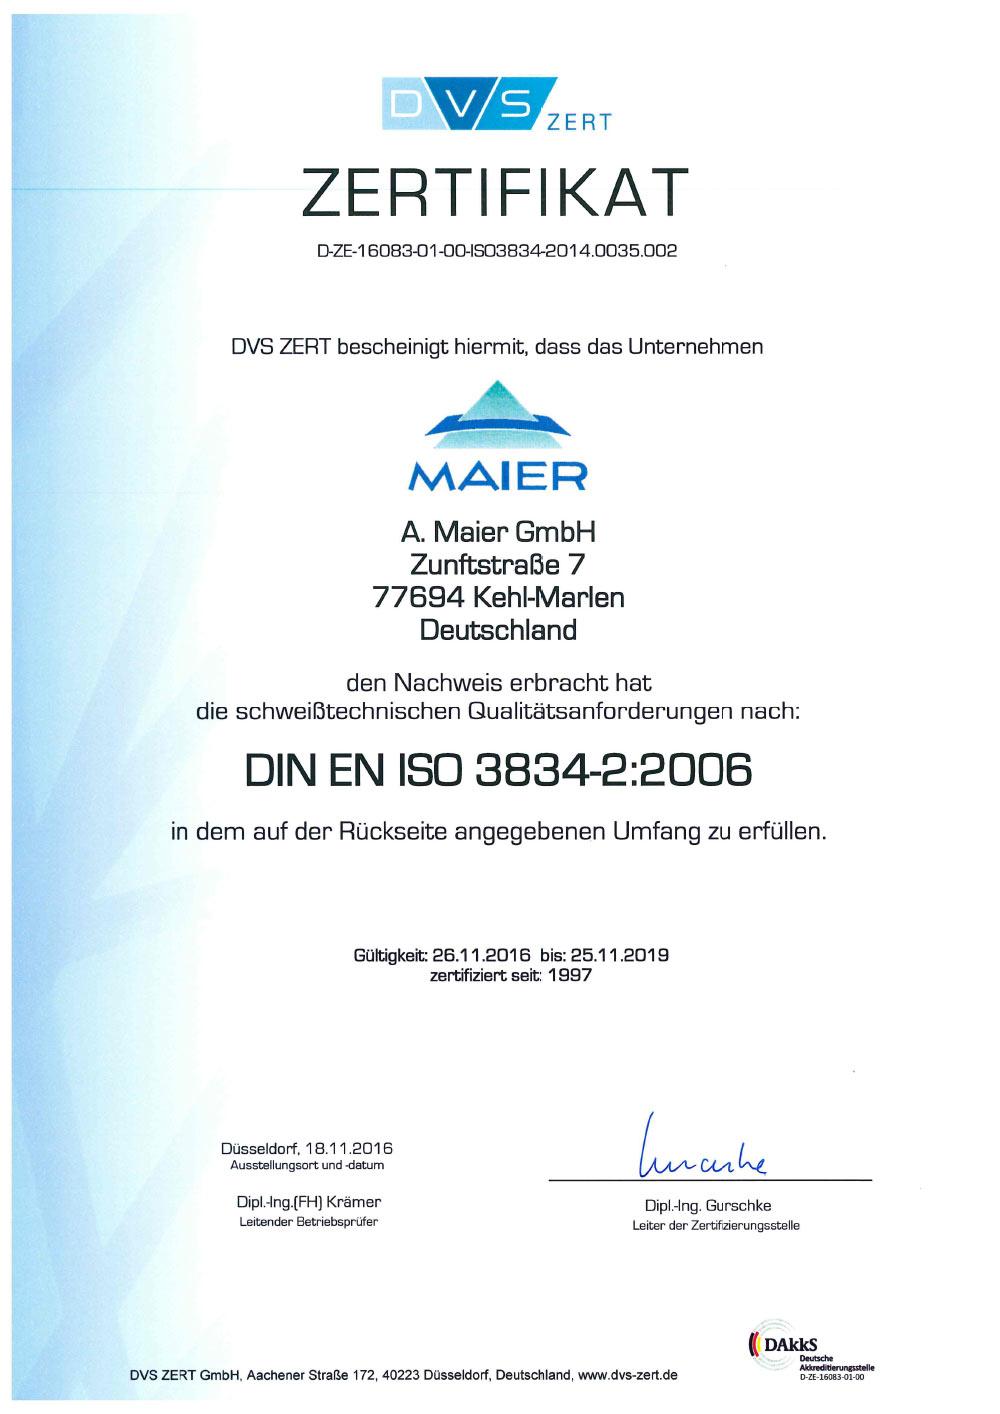 Zertifikat_3834__A_Maier_GmbH_bis_11_2019-1_Seite1